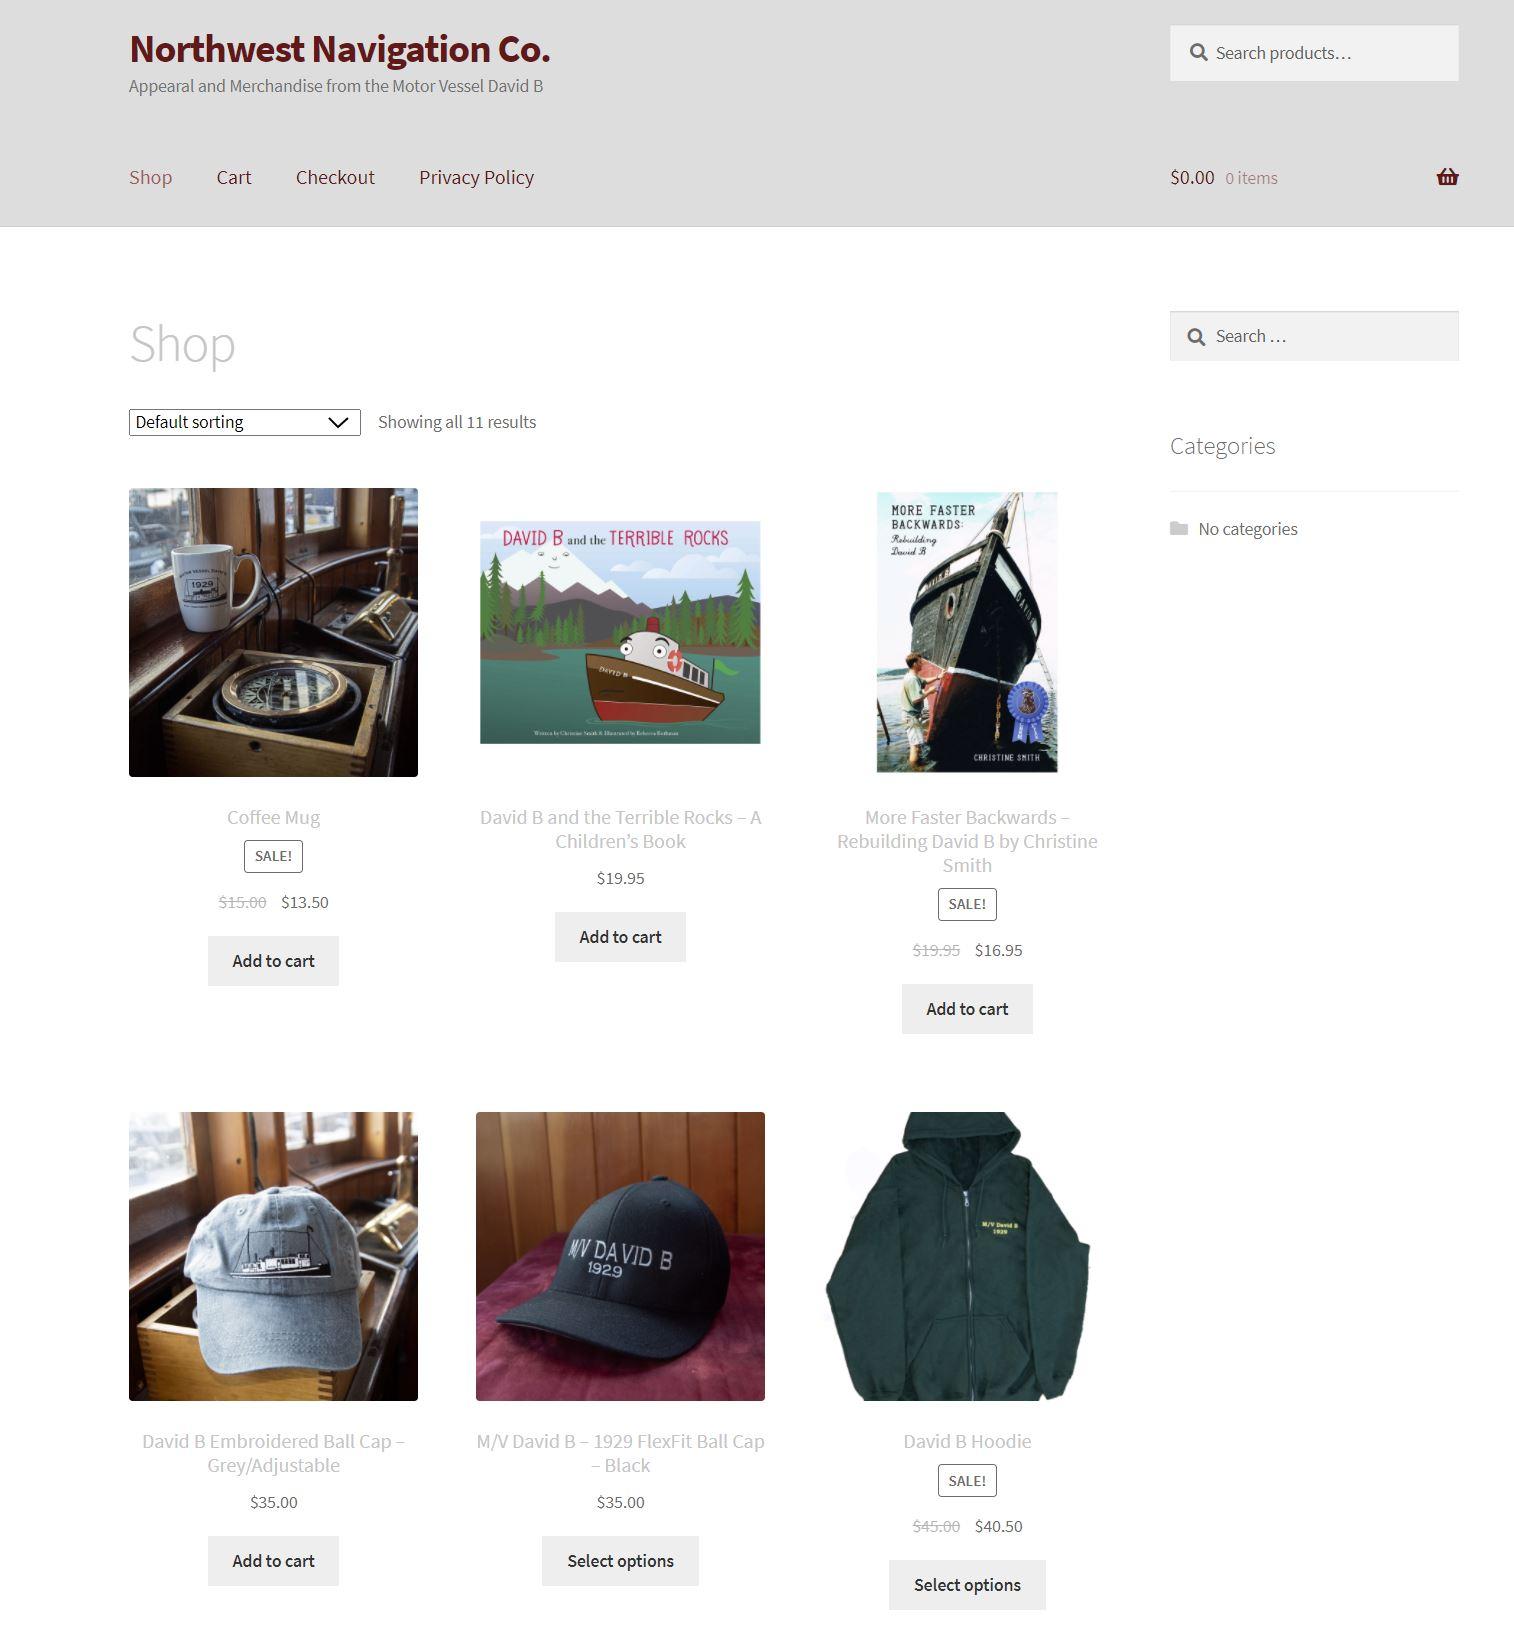 David B Merchandise